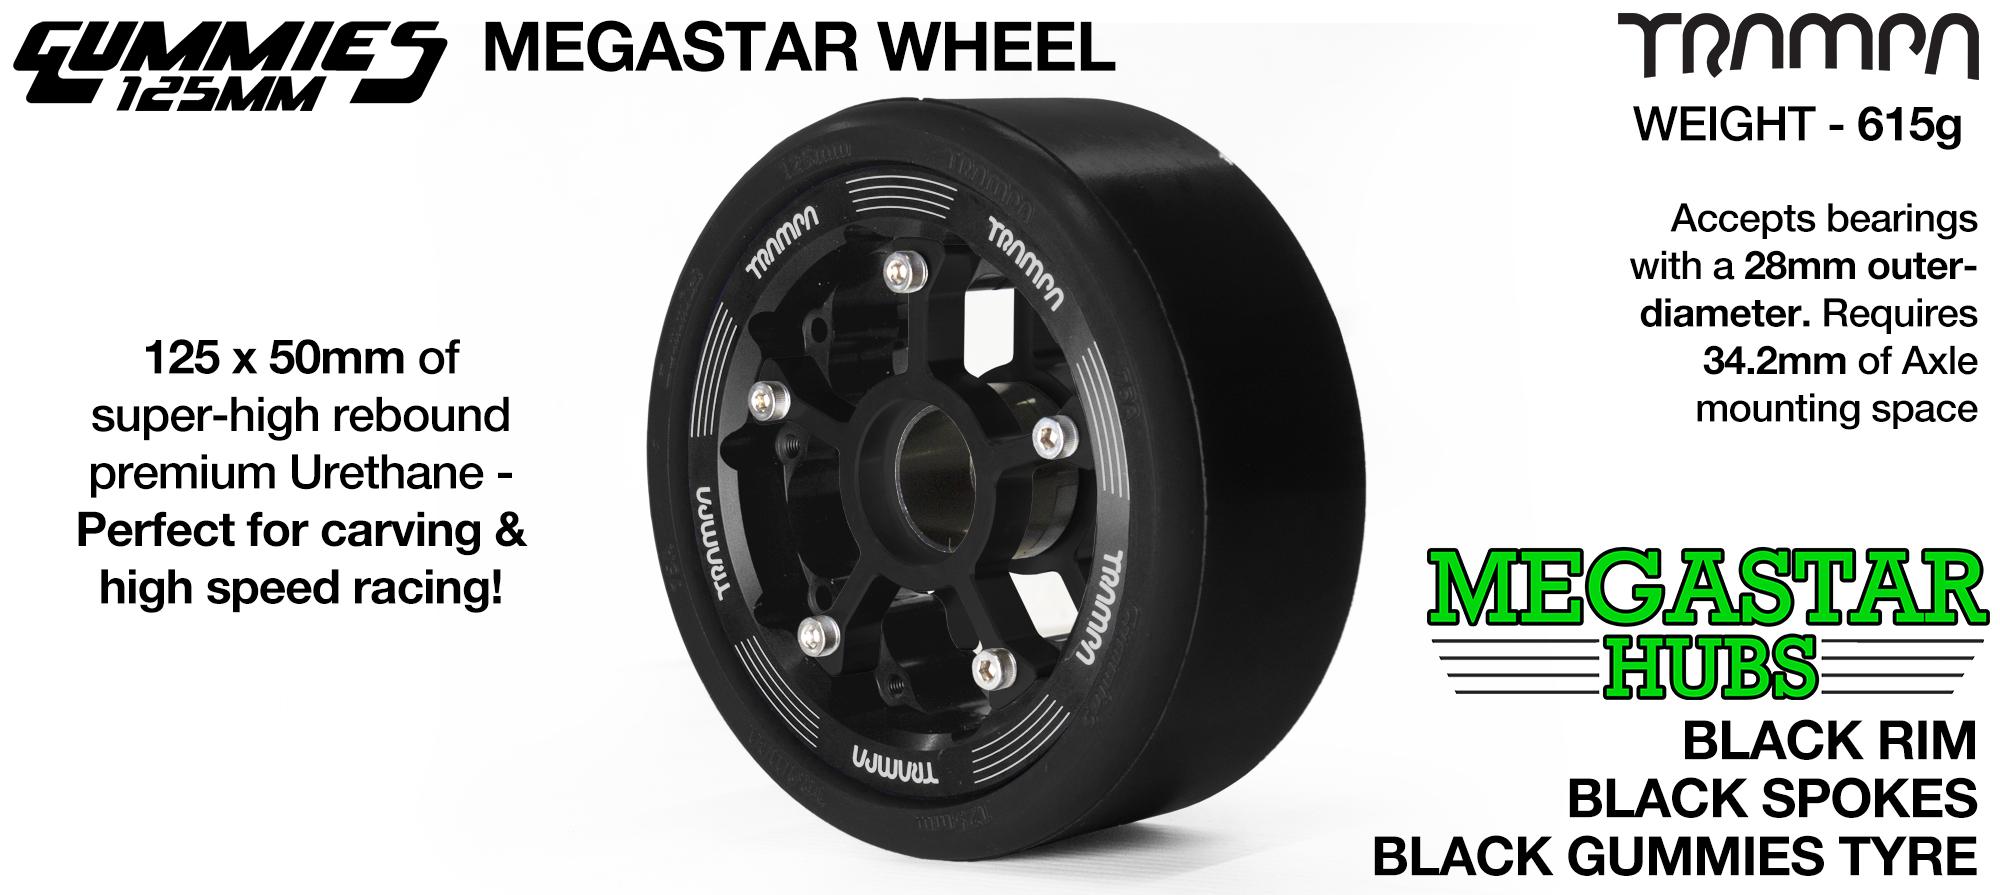 BLACK MEGASTAR Rim with BLACK Spokes with BLACK Gummies - The Ultimate Longboard Wheel